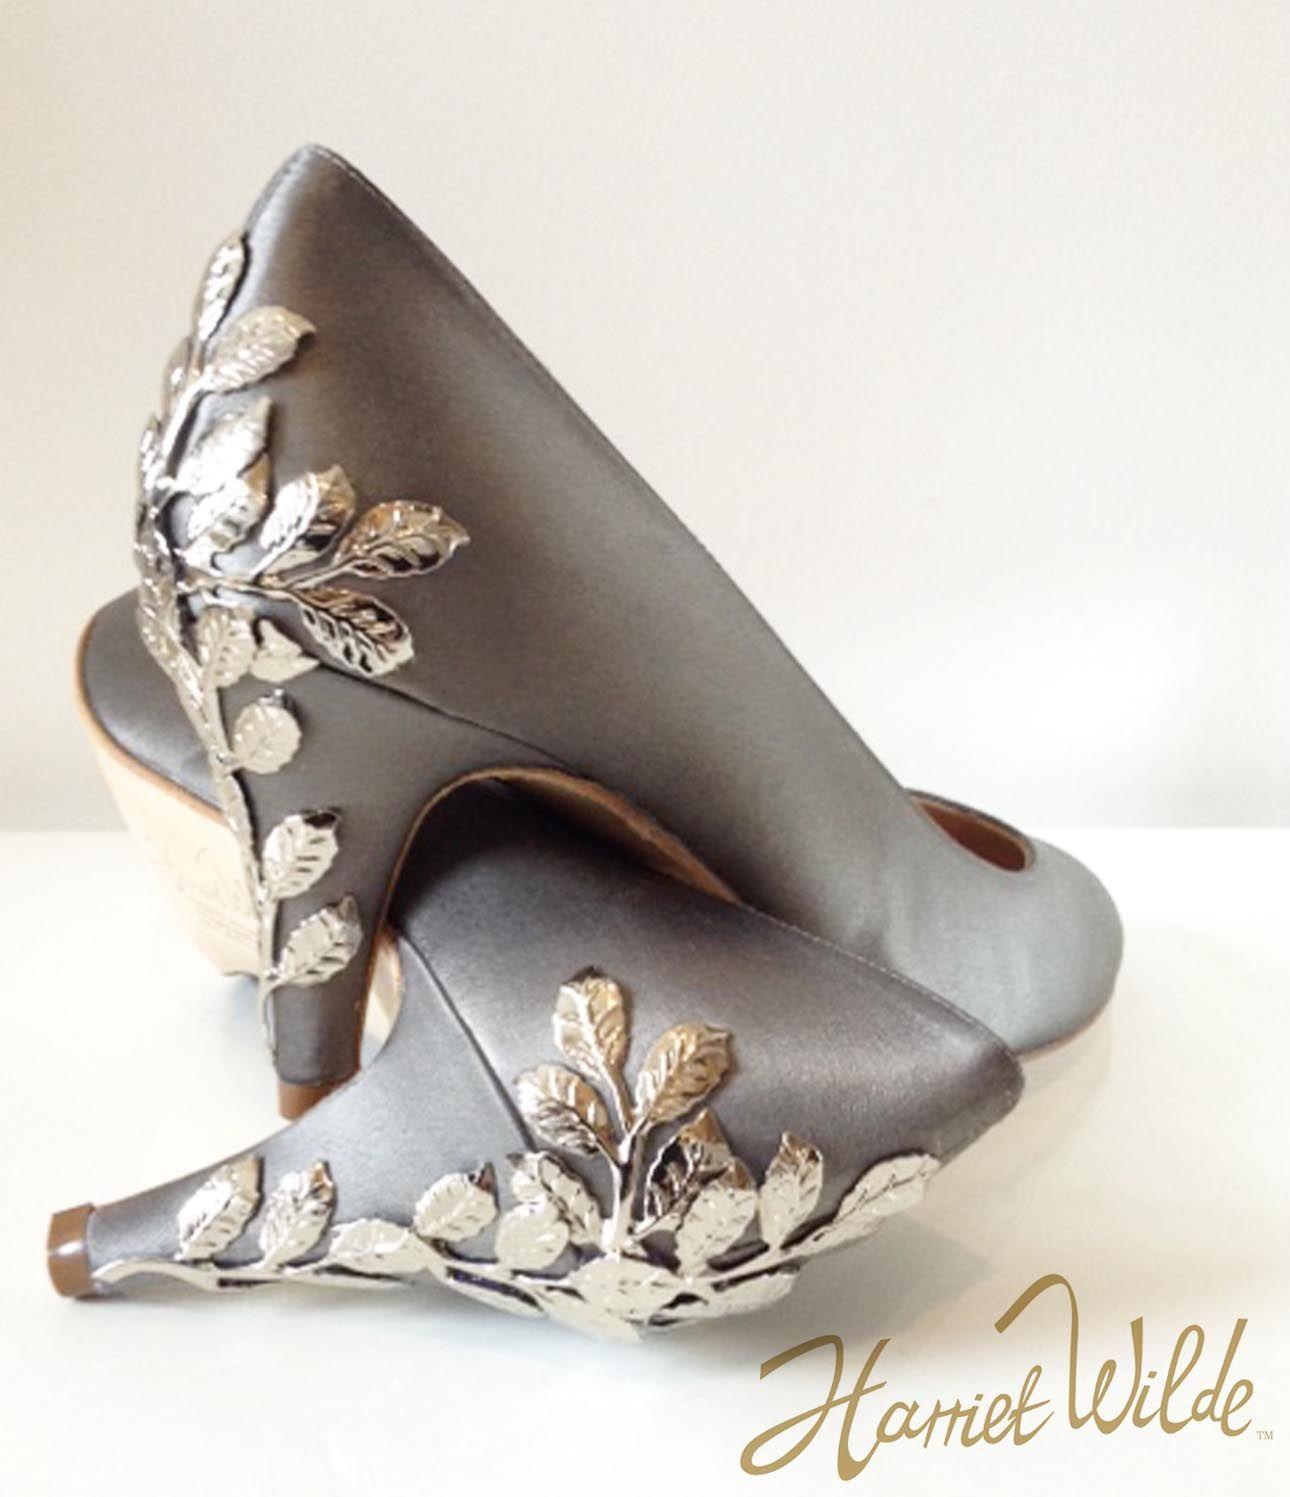 Jet Bespoke Harriet Wilde Wedding Shoes Price On Request Visit Http